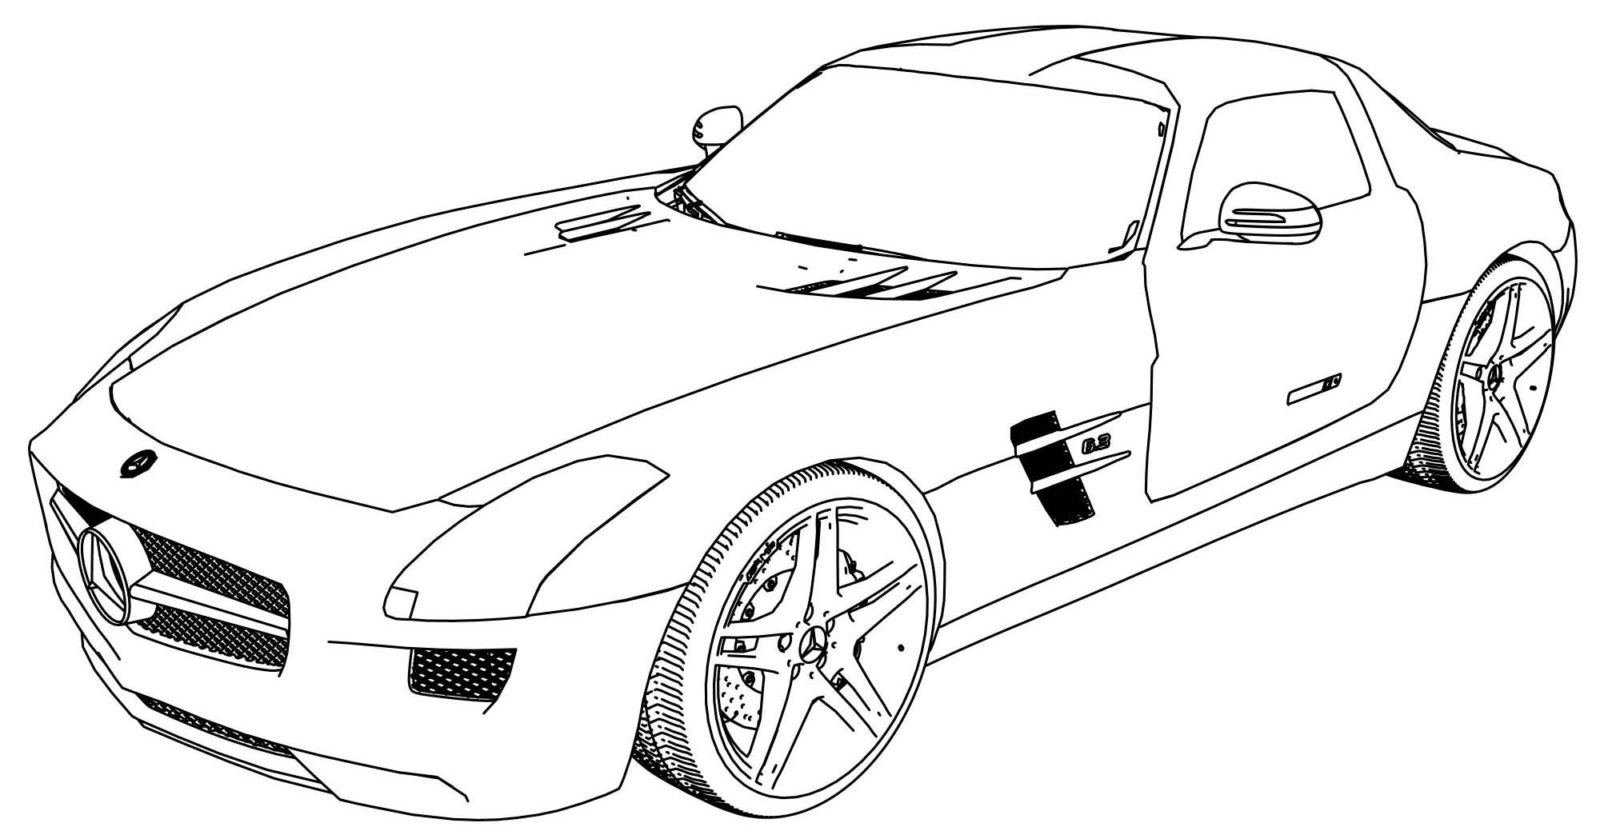 Раскраска гоночная машина Мерседес